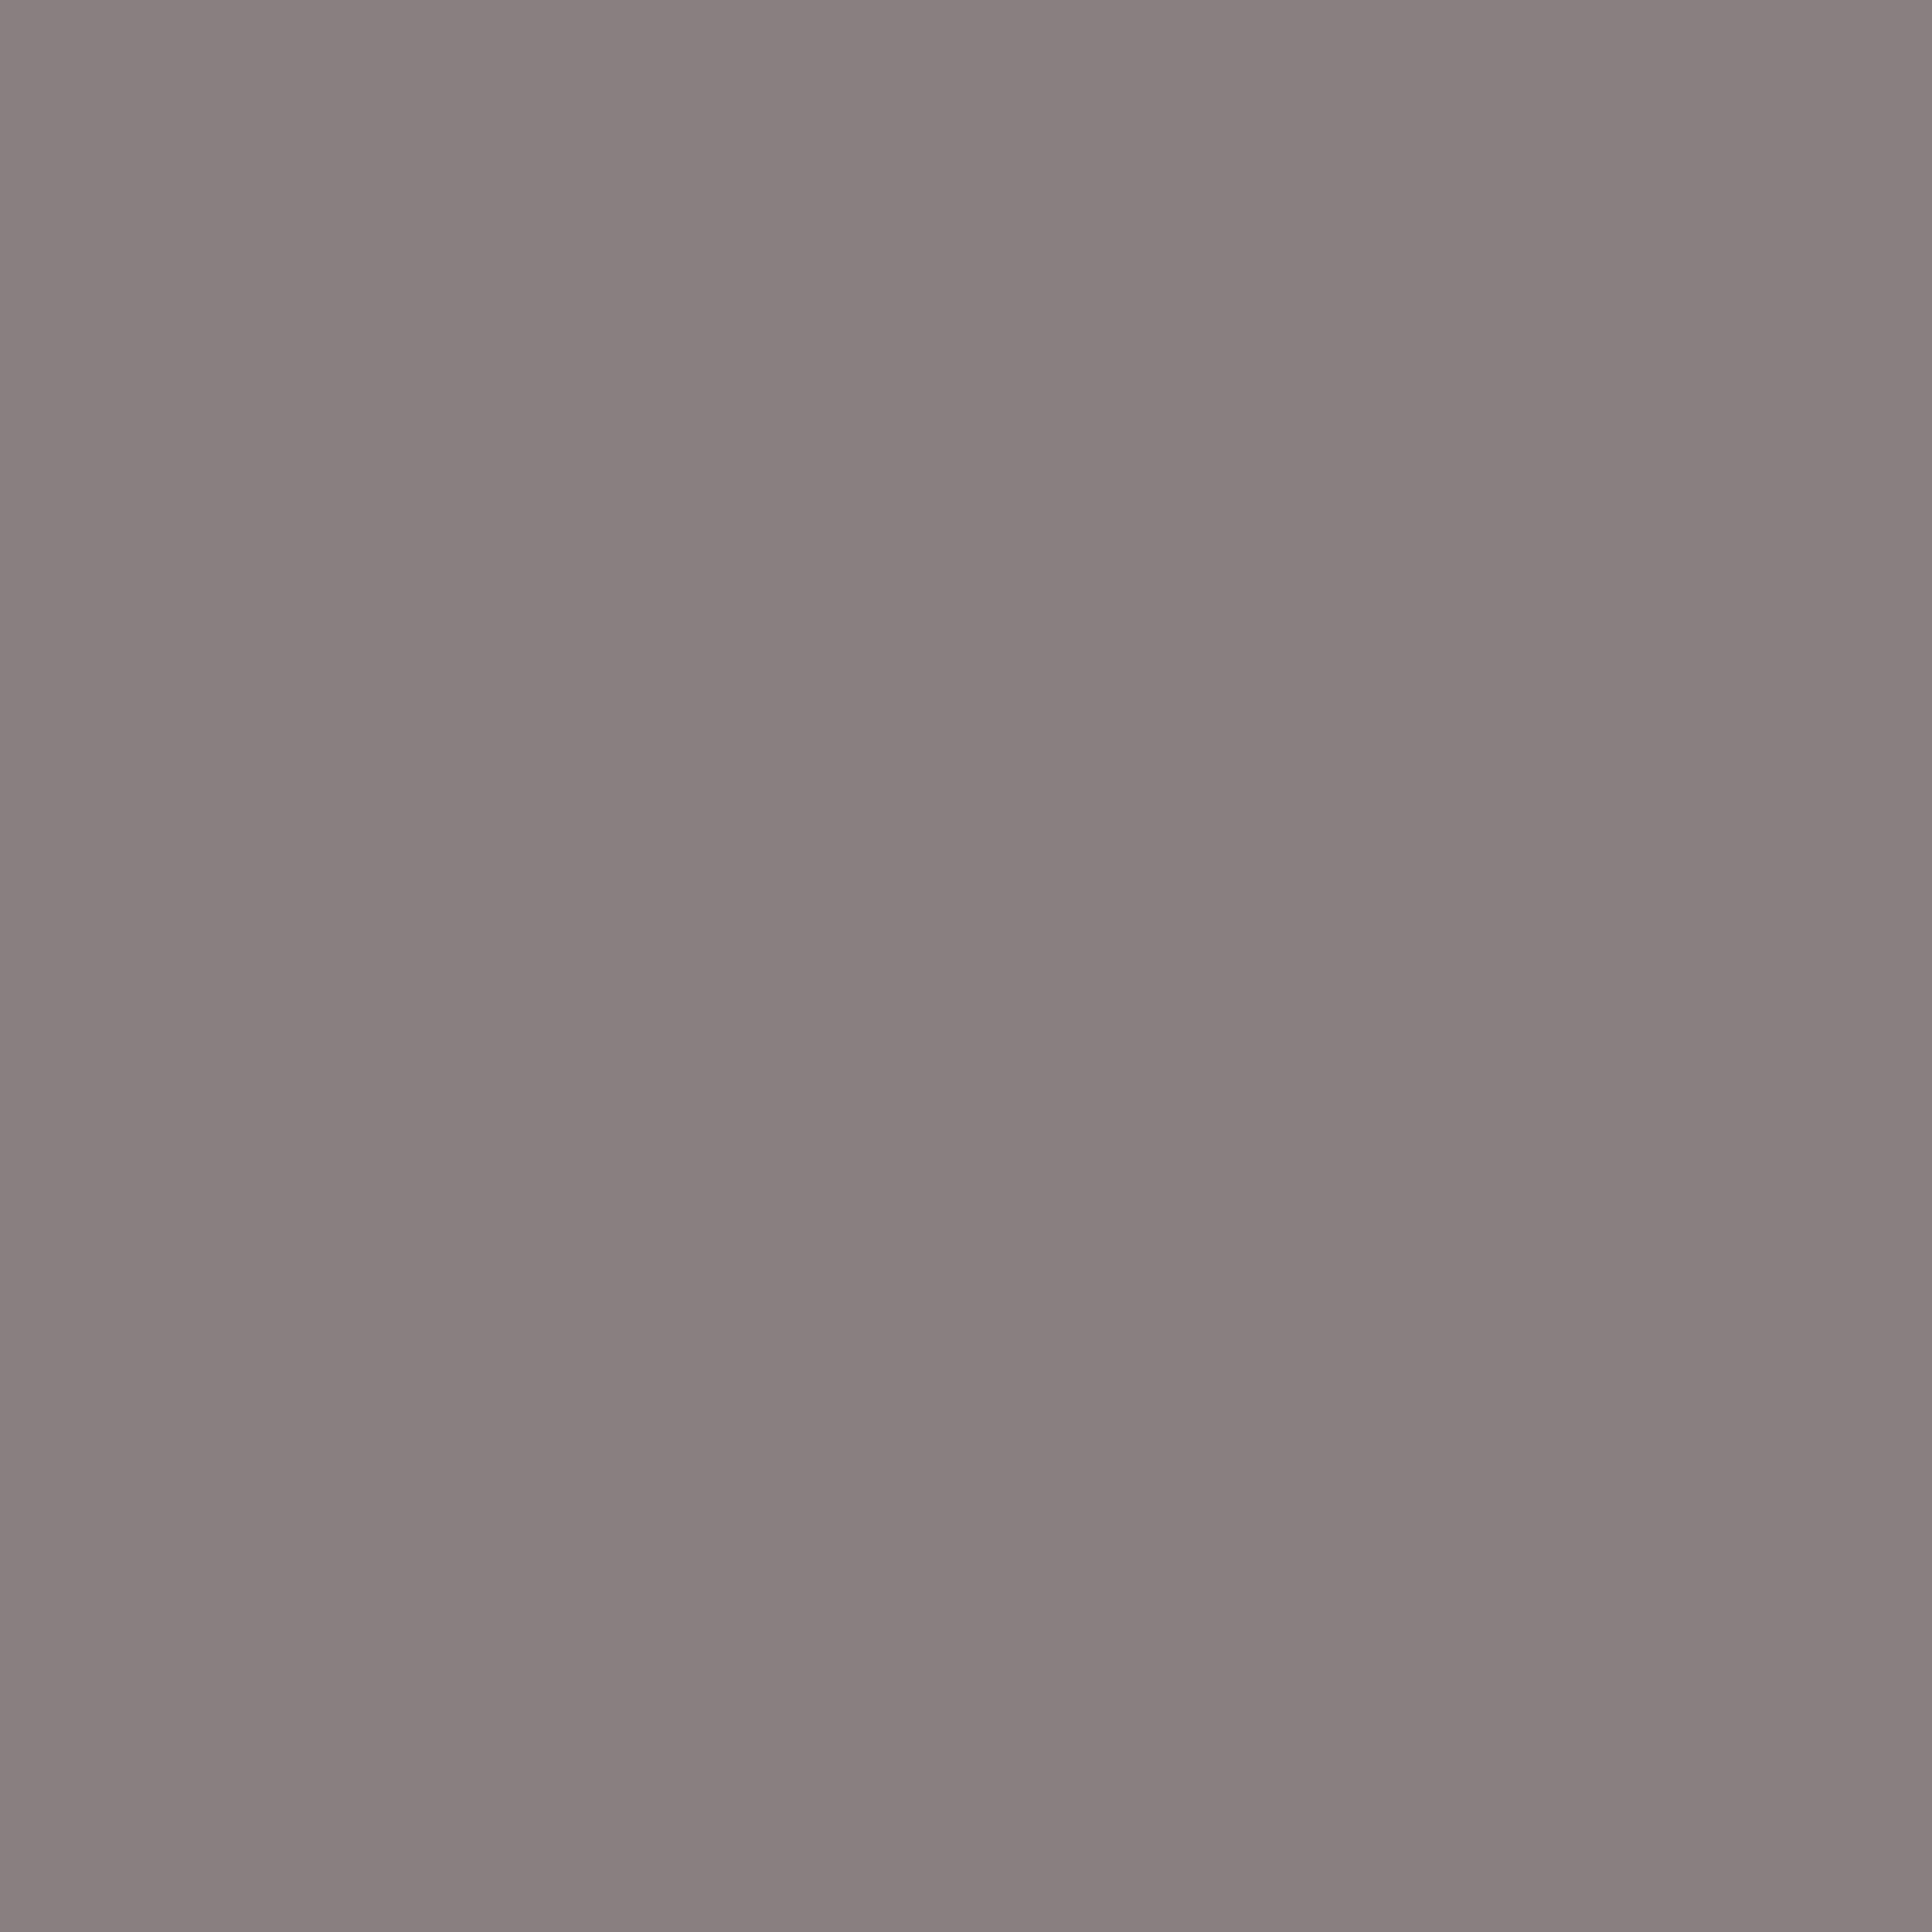 3600x3600 Rocket Metallic Solid Color Background